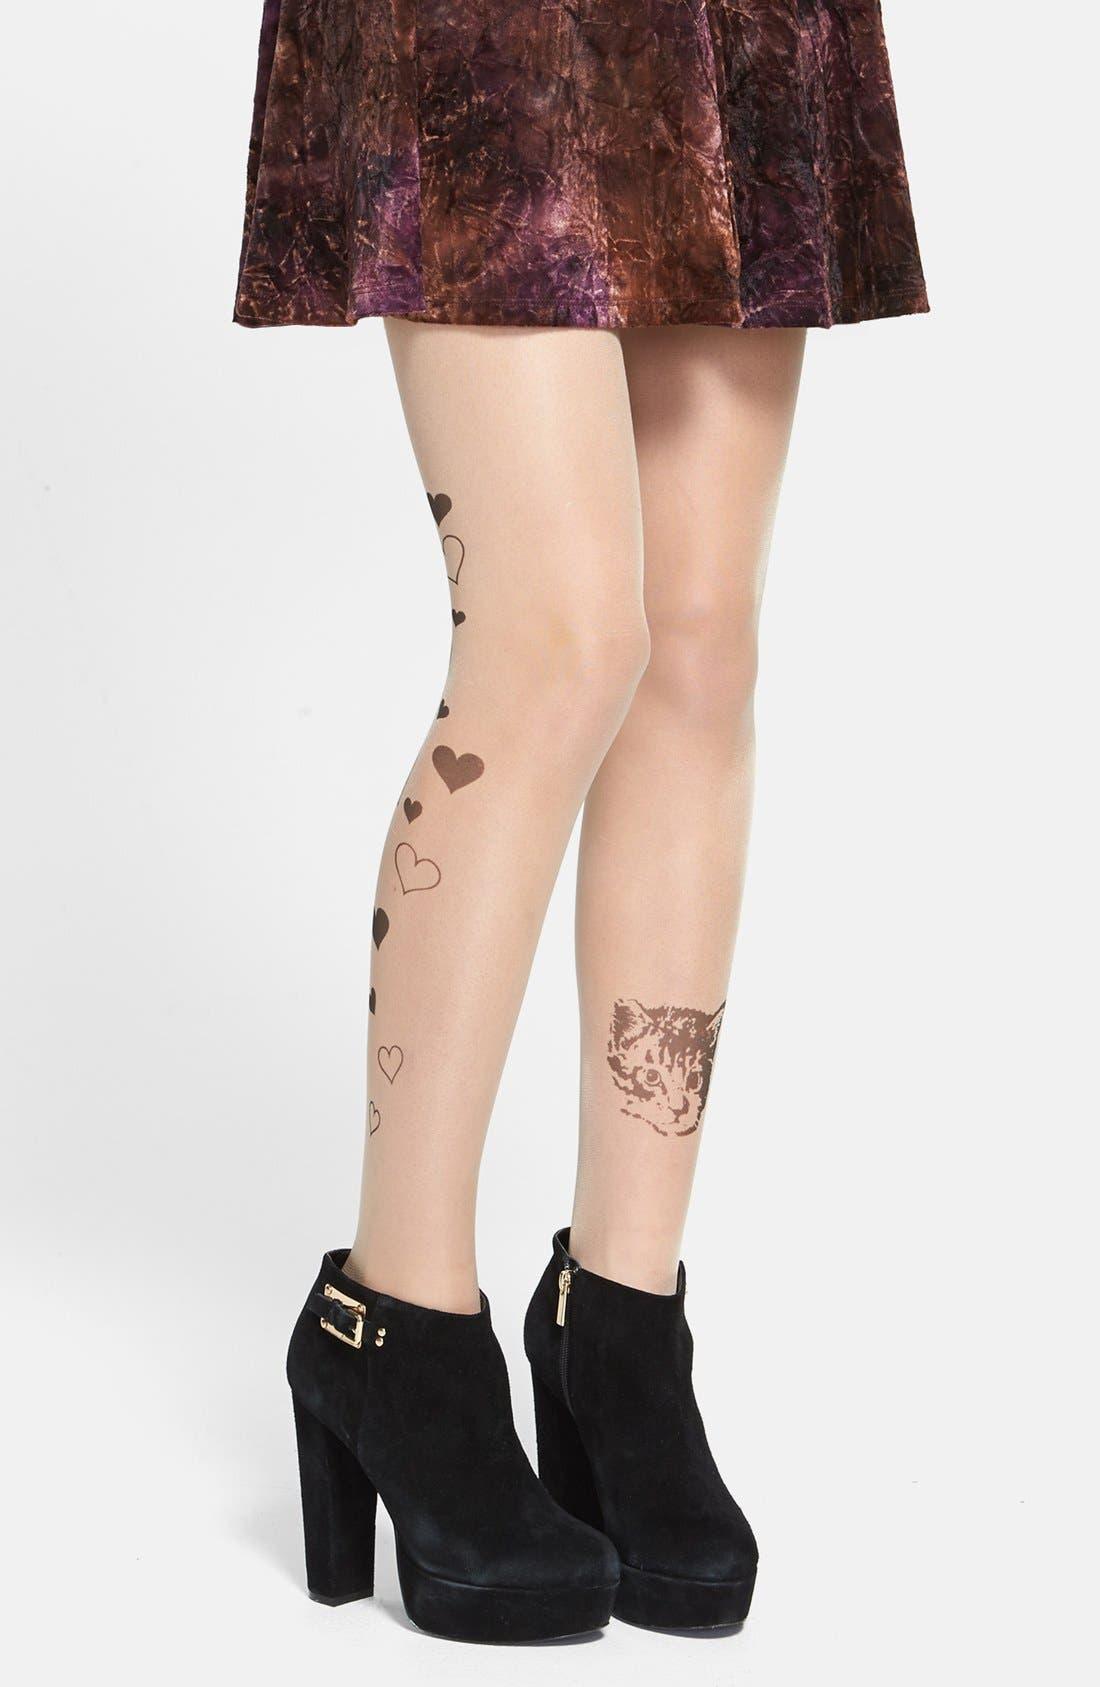 Main Image - BP. 'Kitty & Heart Tattoo' Tights (Juniors)